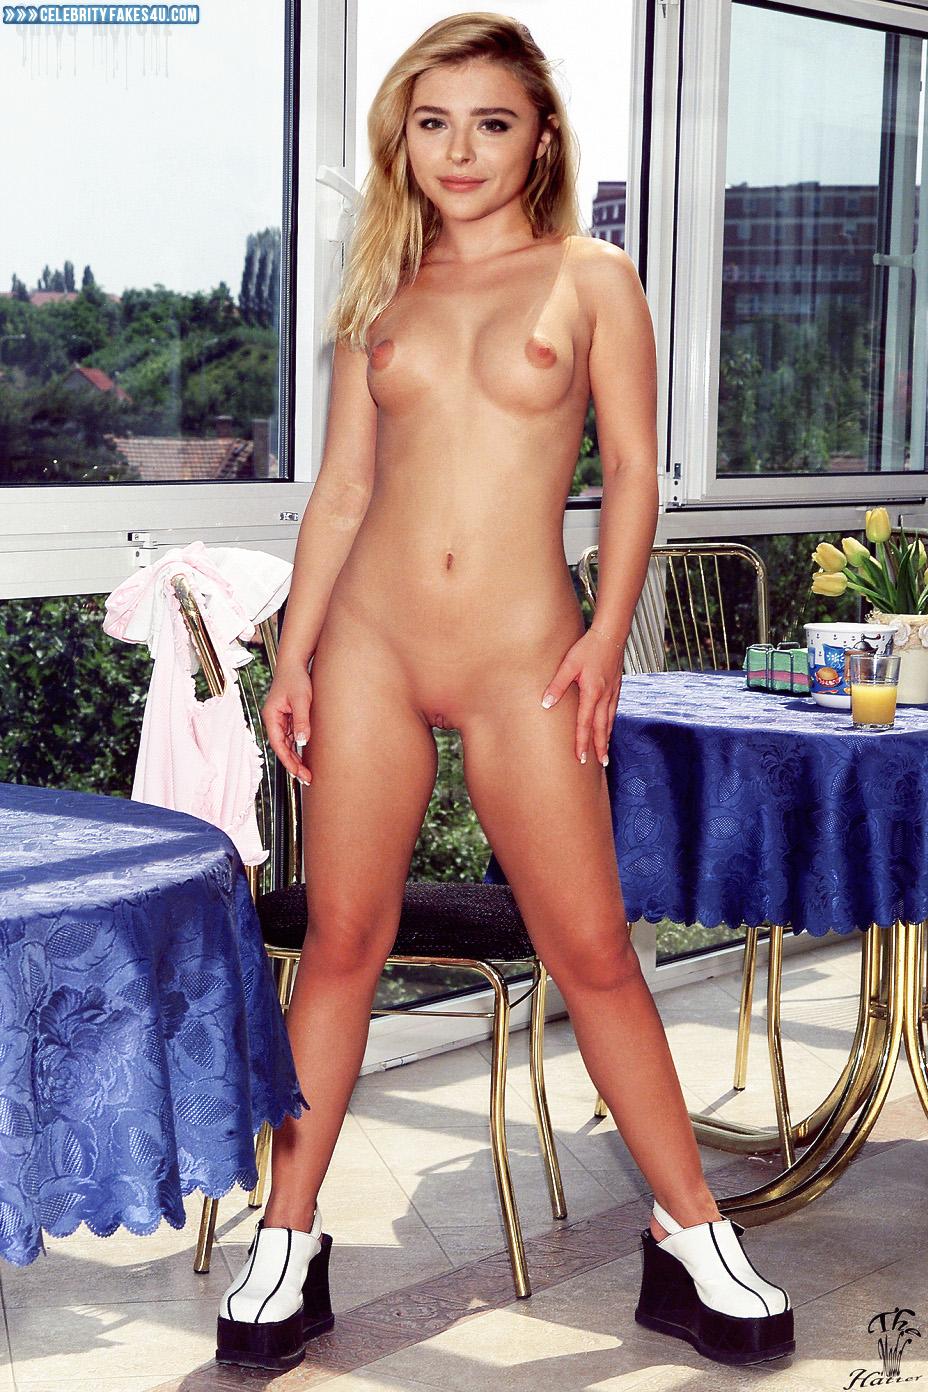 Chloe grace moretz fake nude